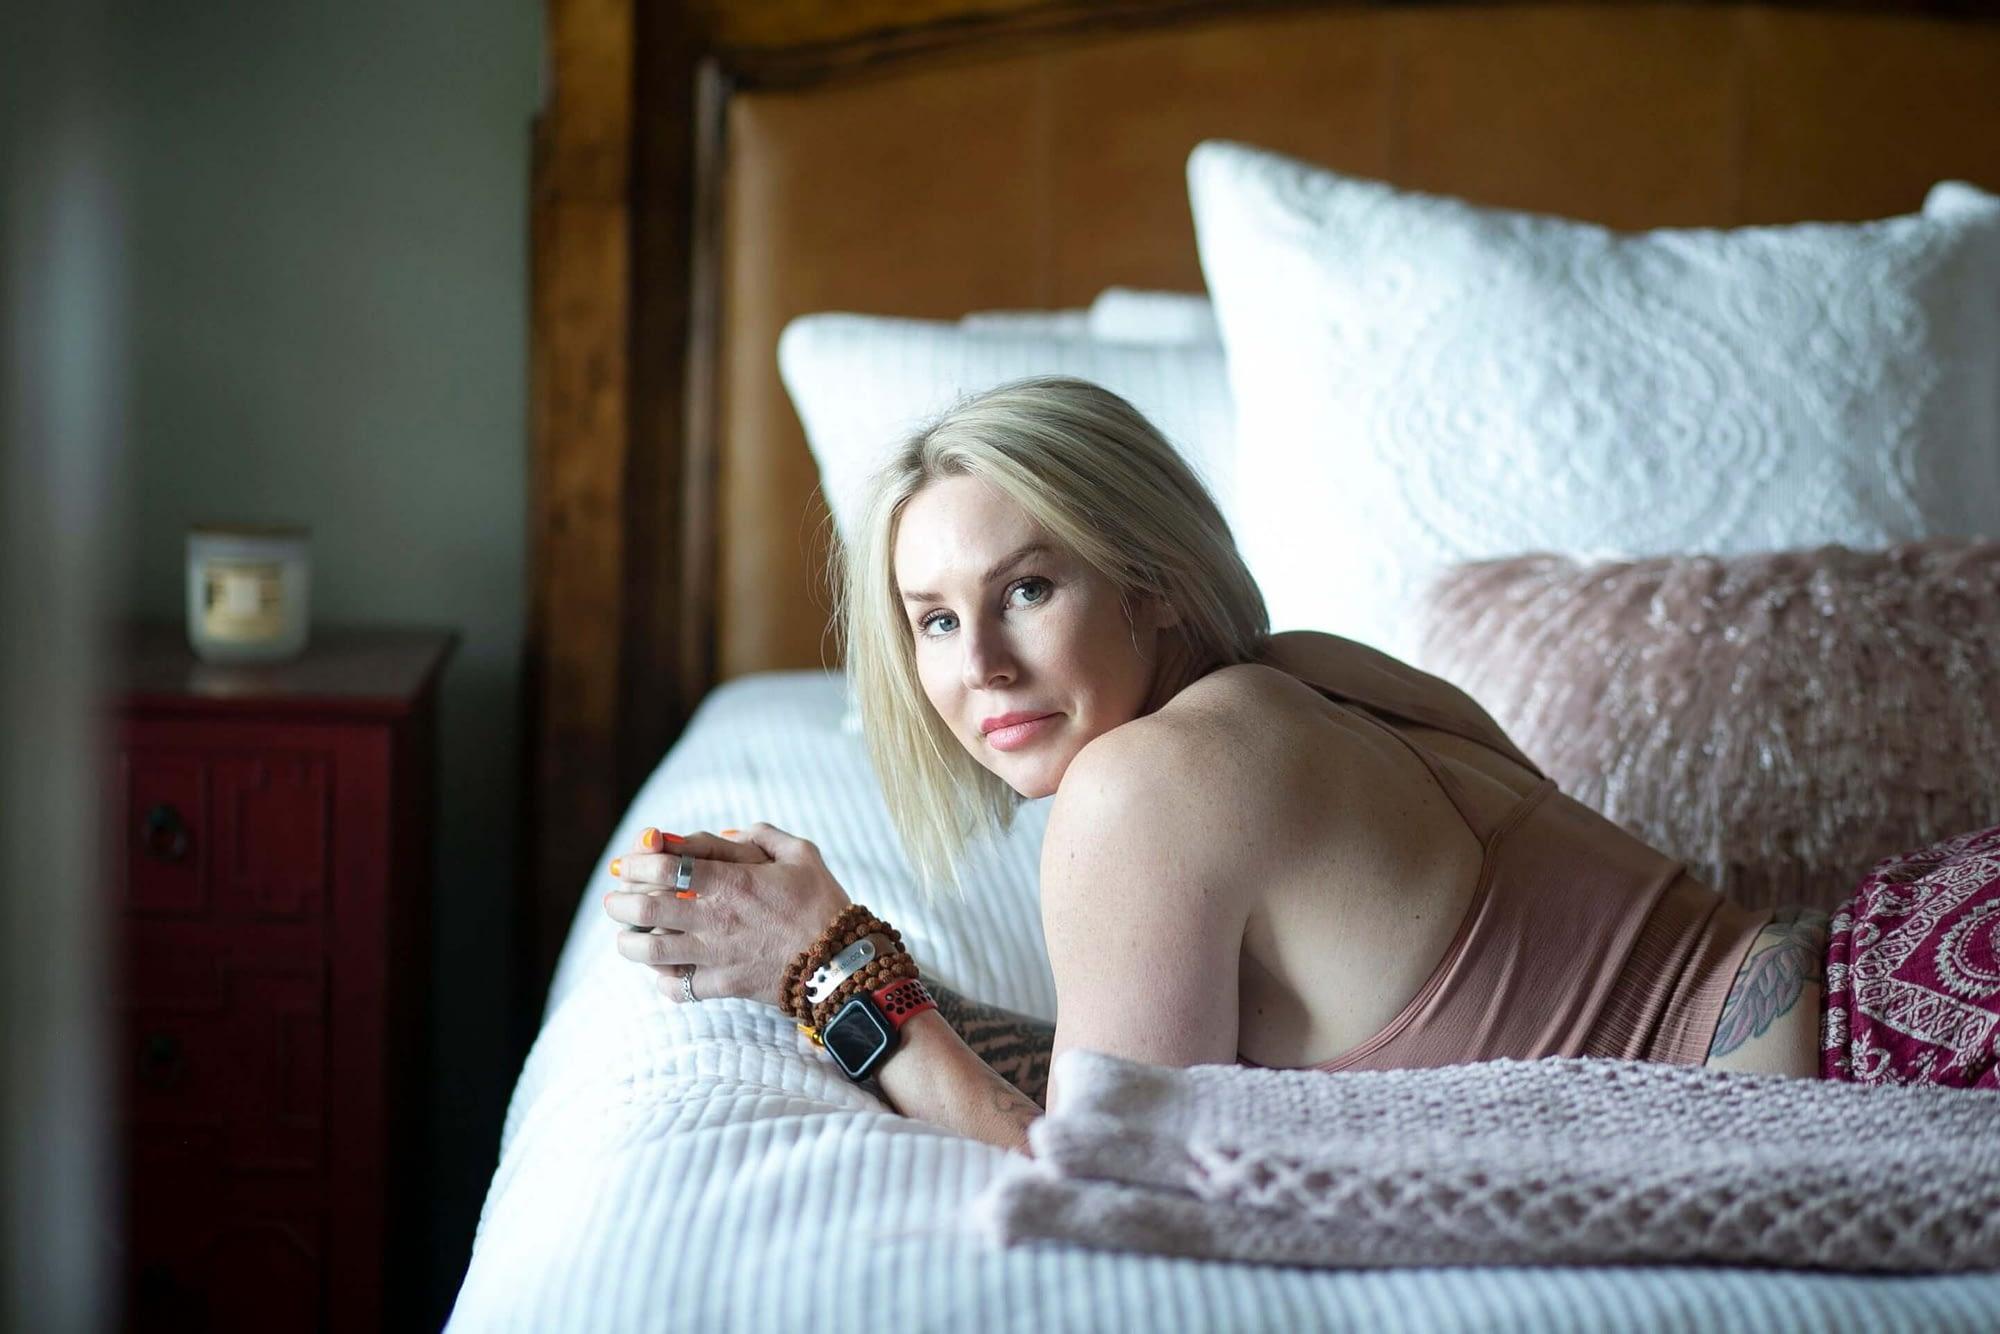 jenn carrasco laying on bed